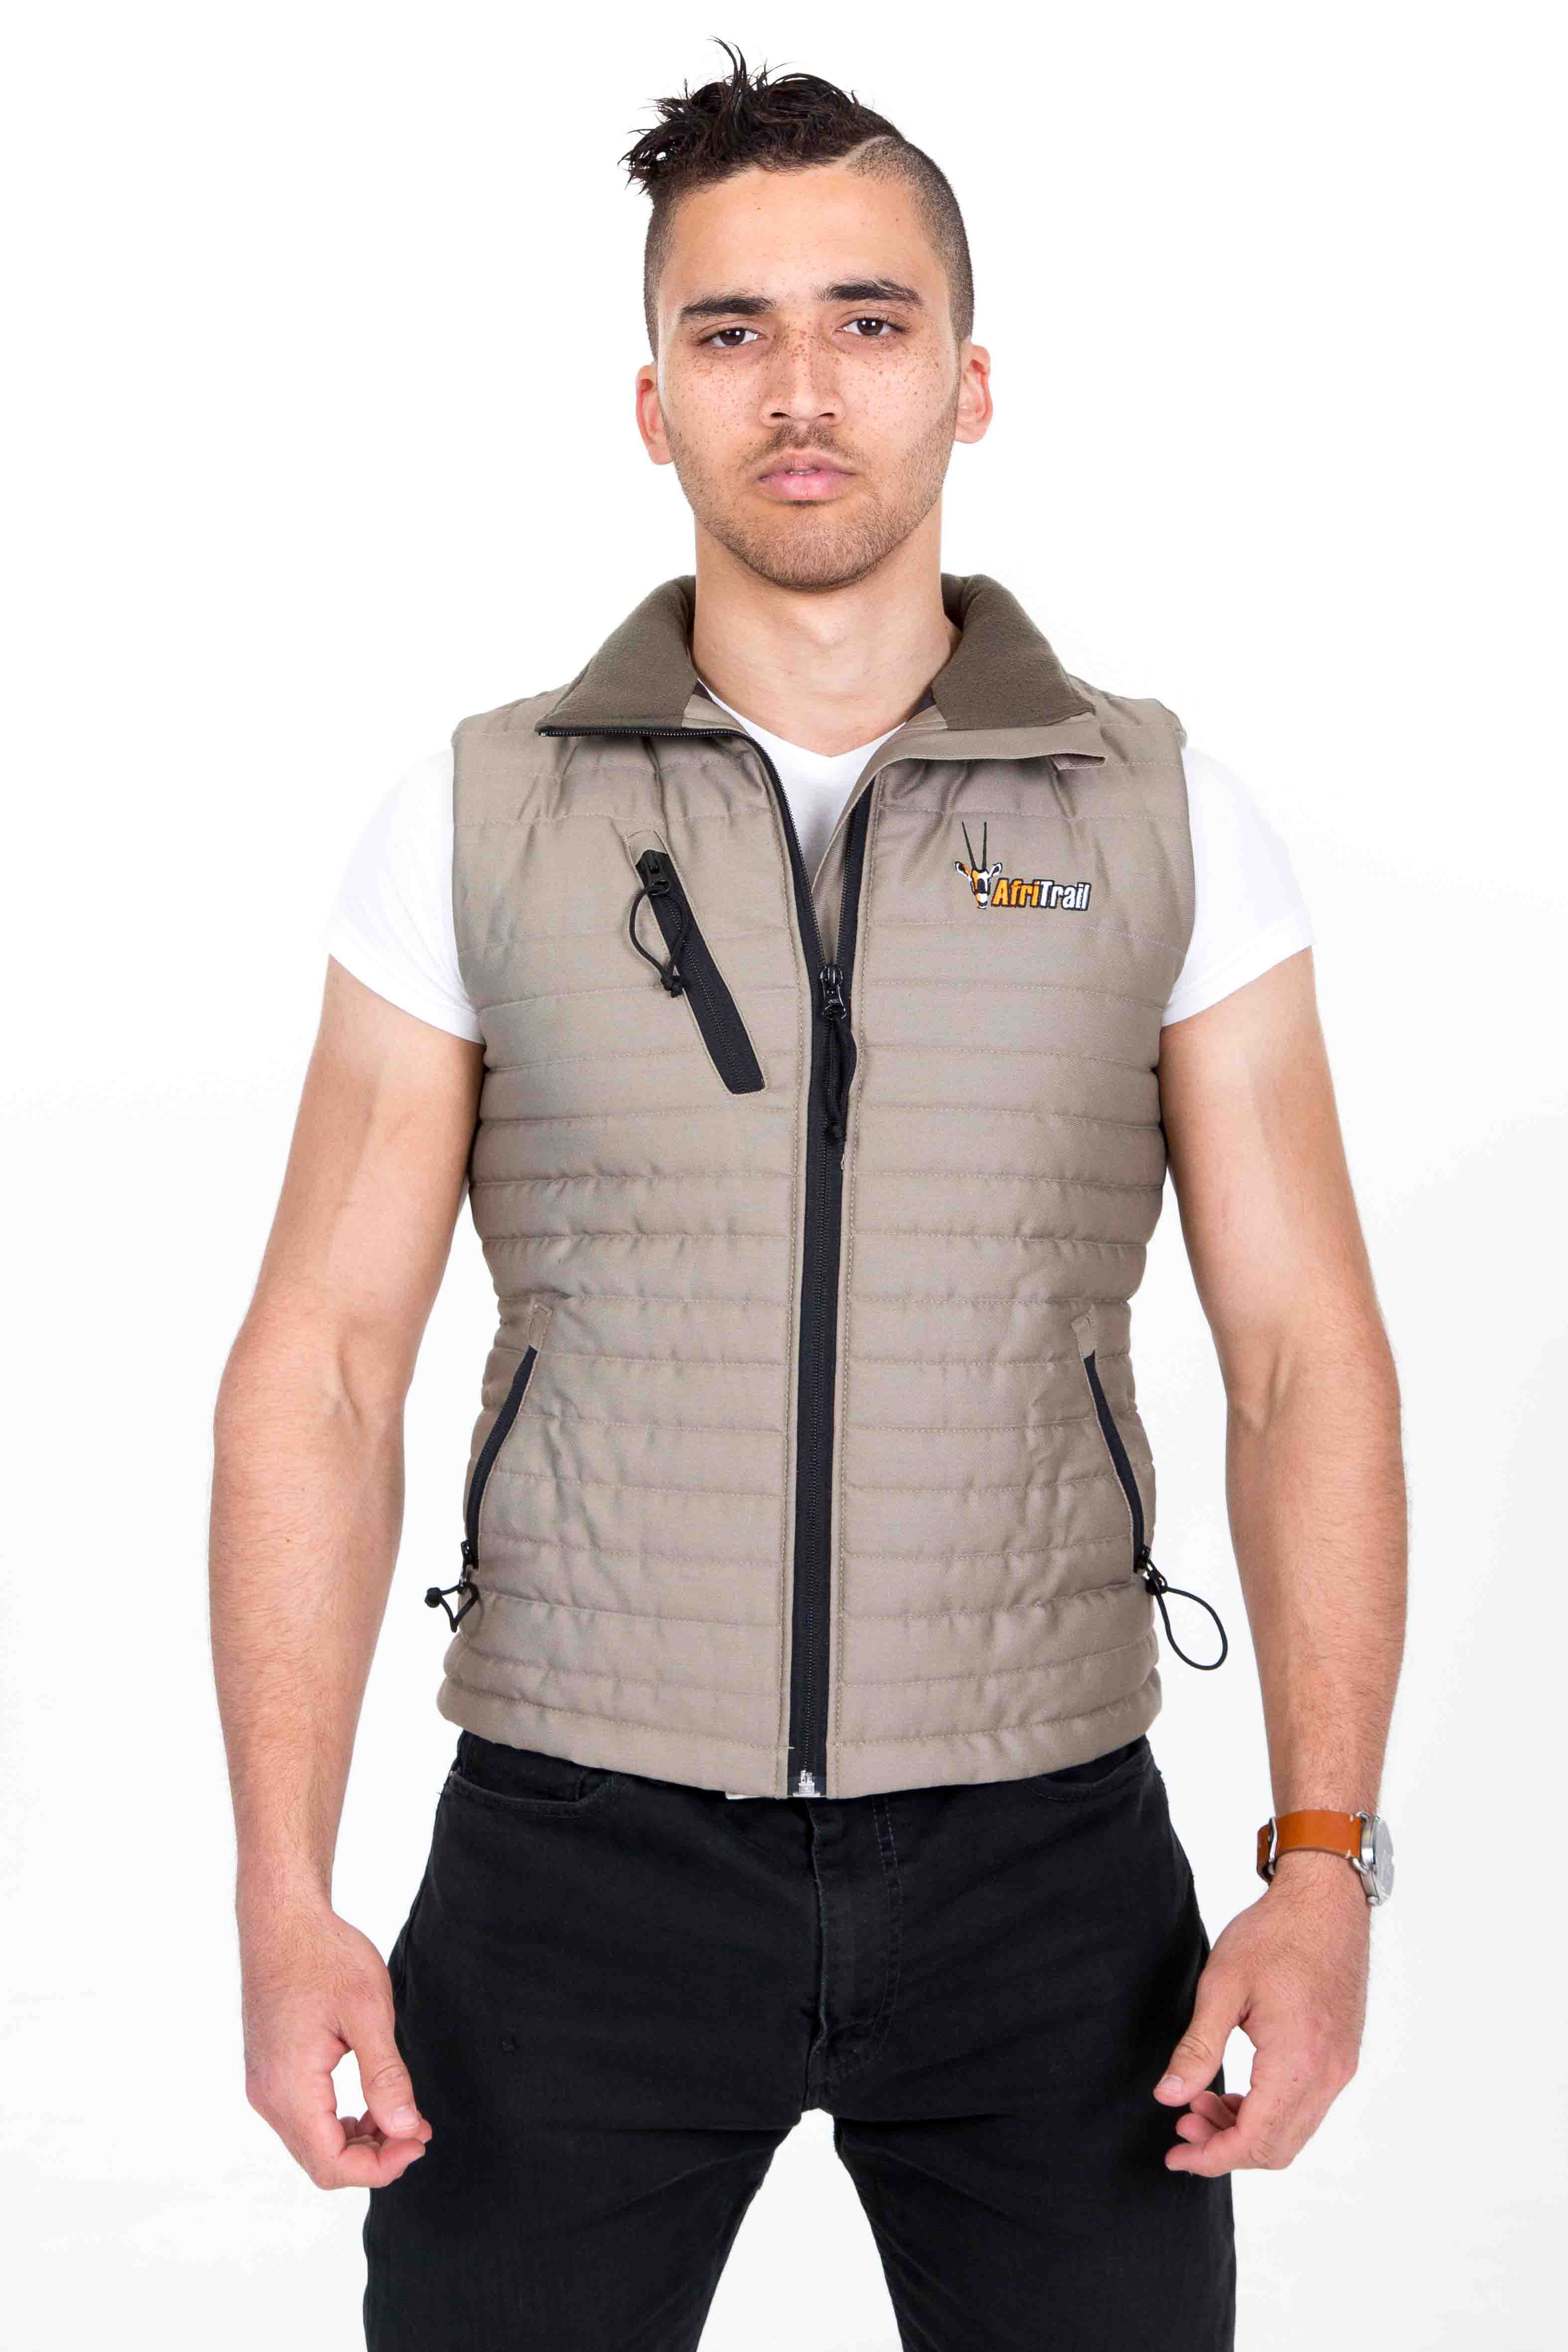 afritrail-pc-twill-men's-padded-vest